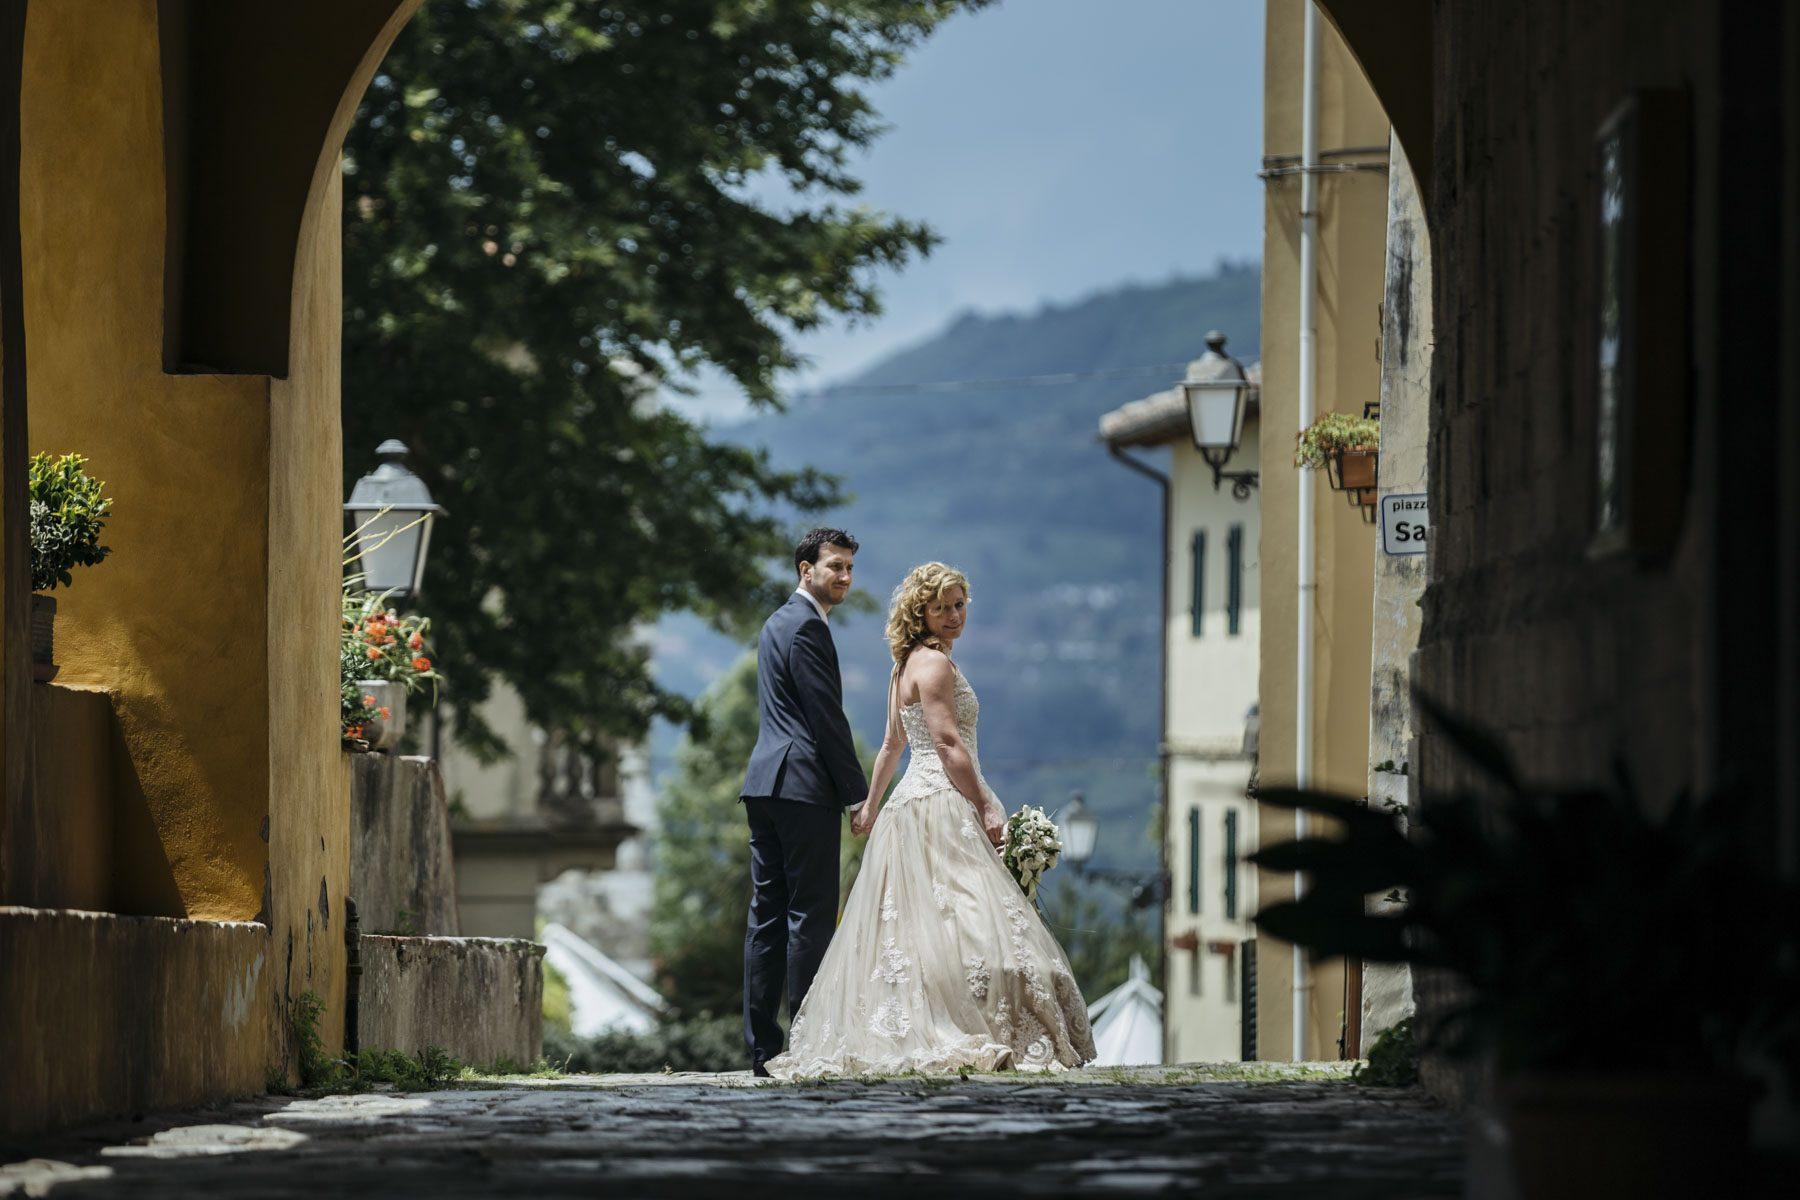 Fotografo Matrimonio Pistoia – Fotografo Matrimonio Toscana - Laura Malucchi Photographer